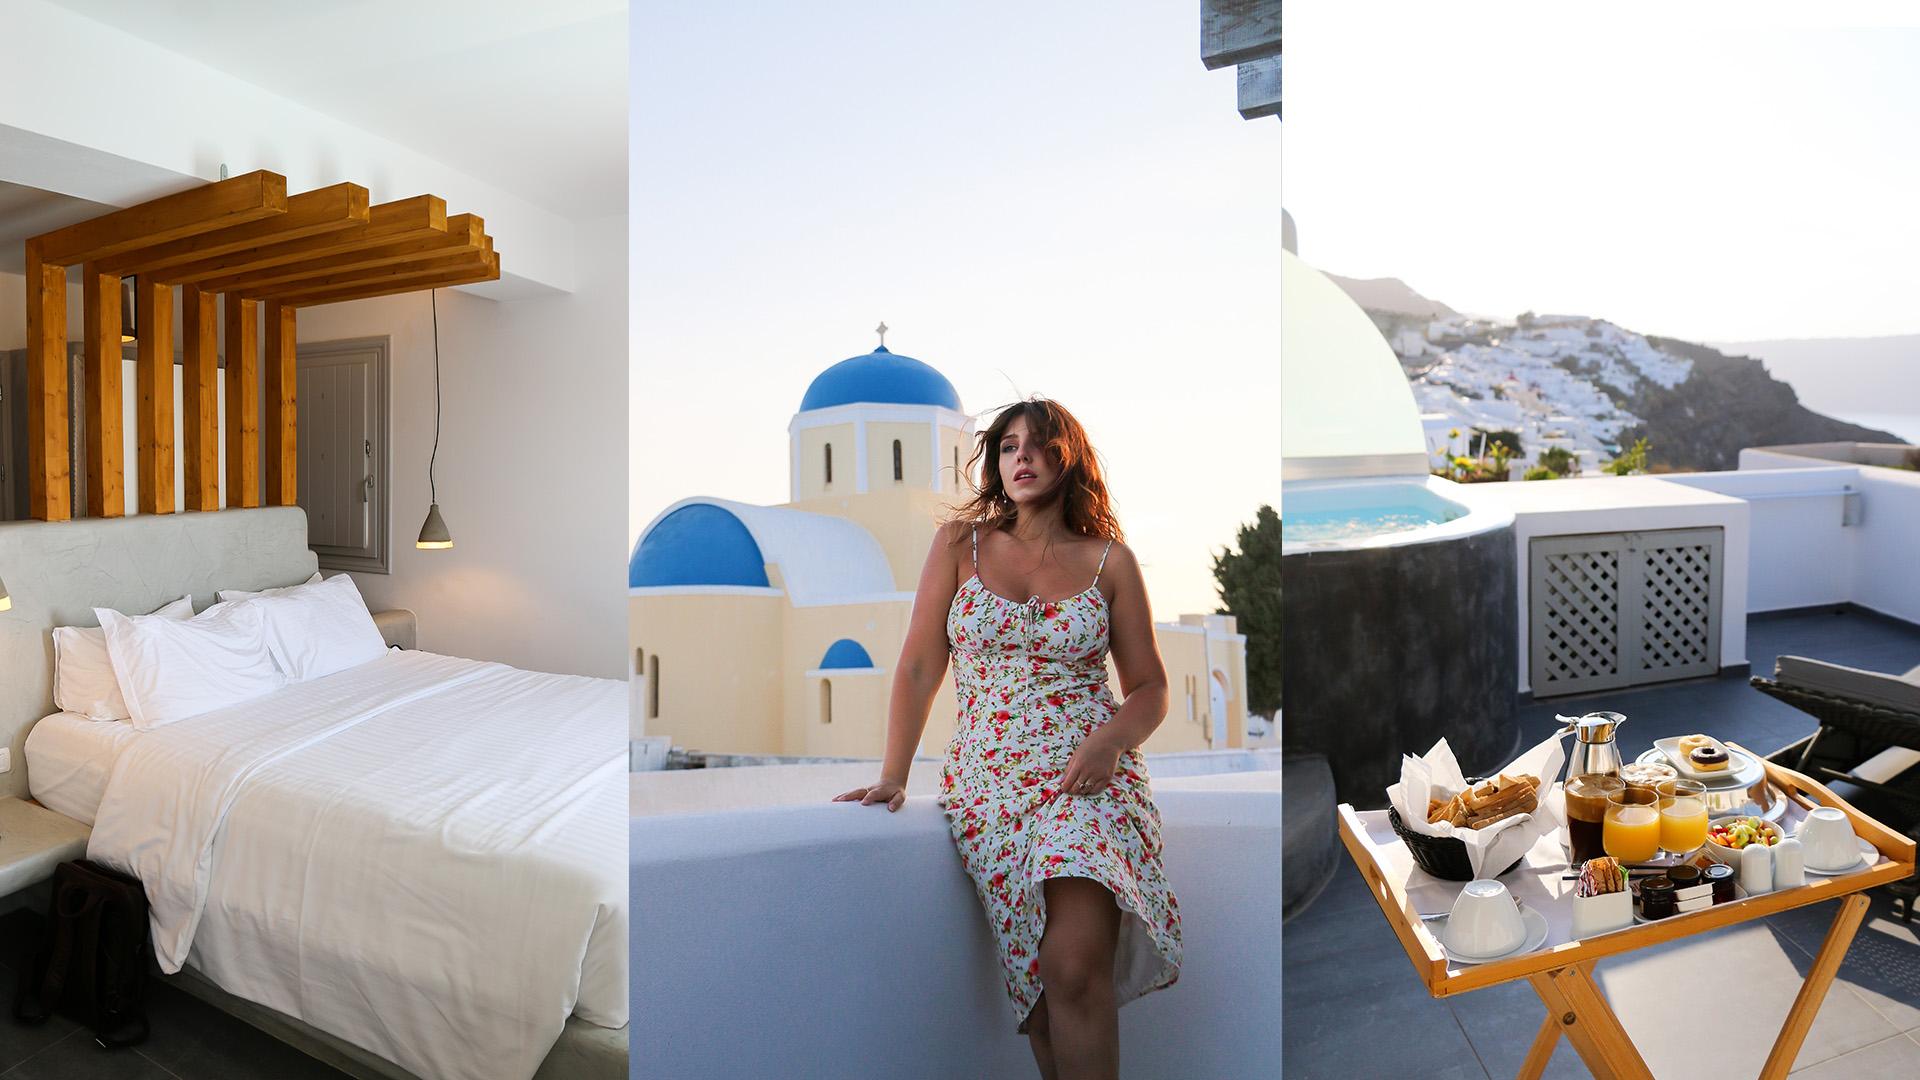 hotel-oia-elitoz-suite-santorin-avis-luxe-voyage-grèce